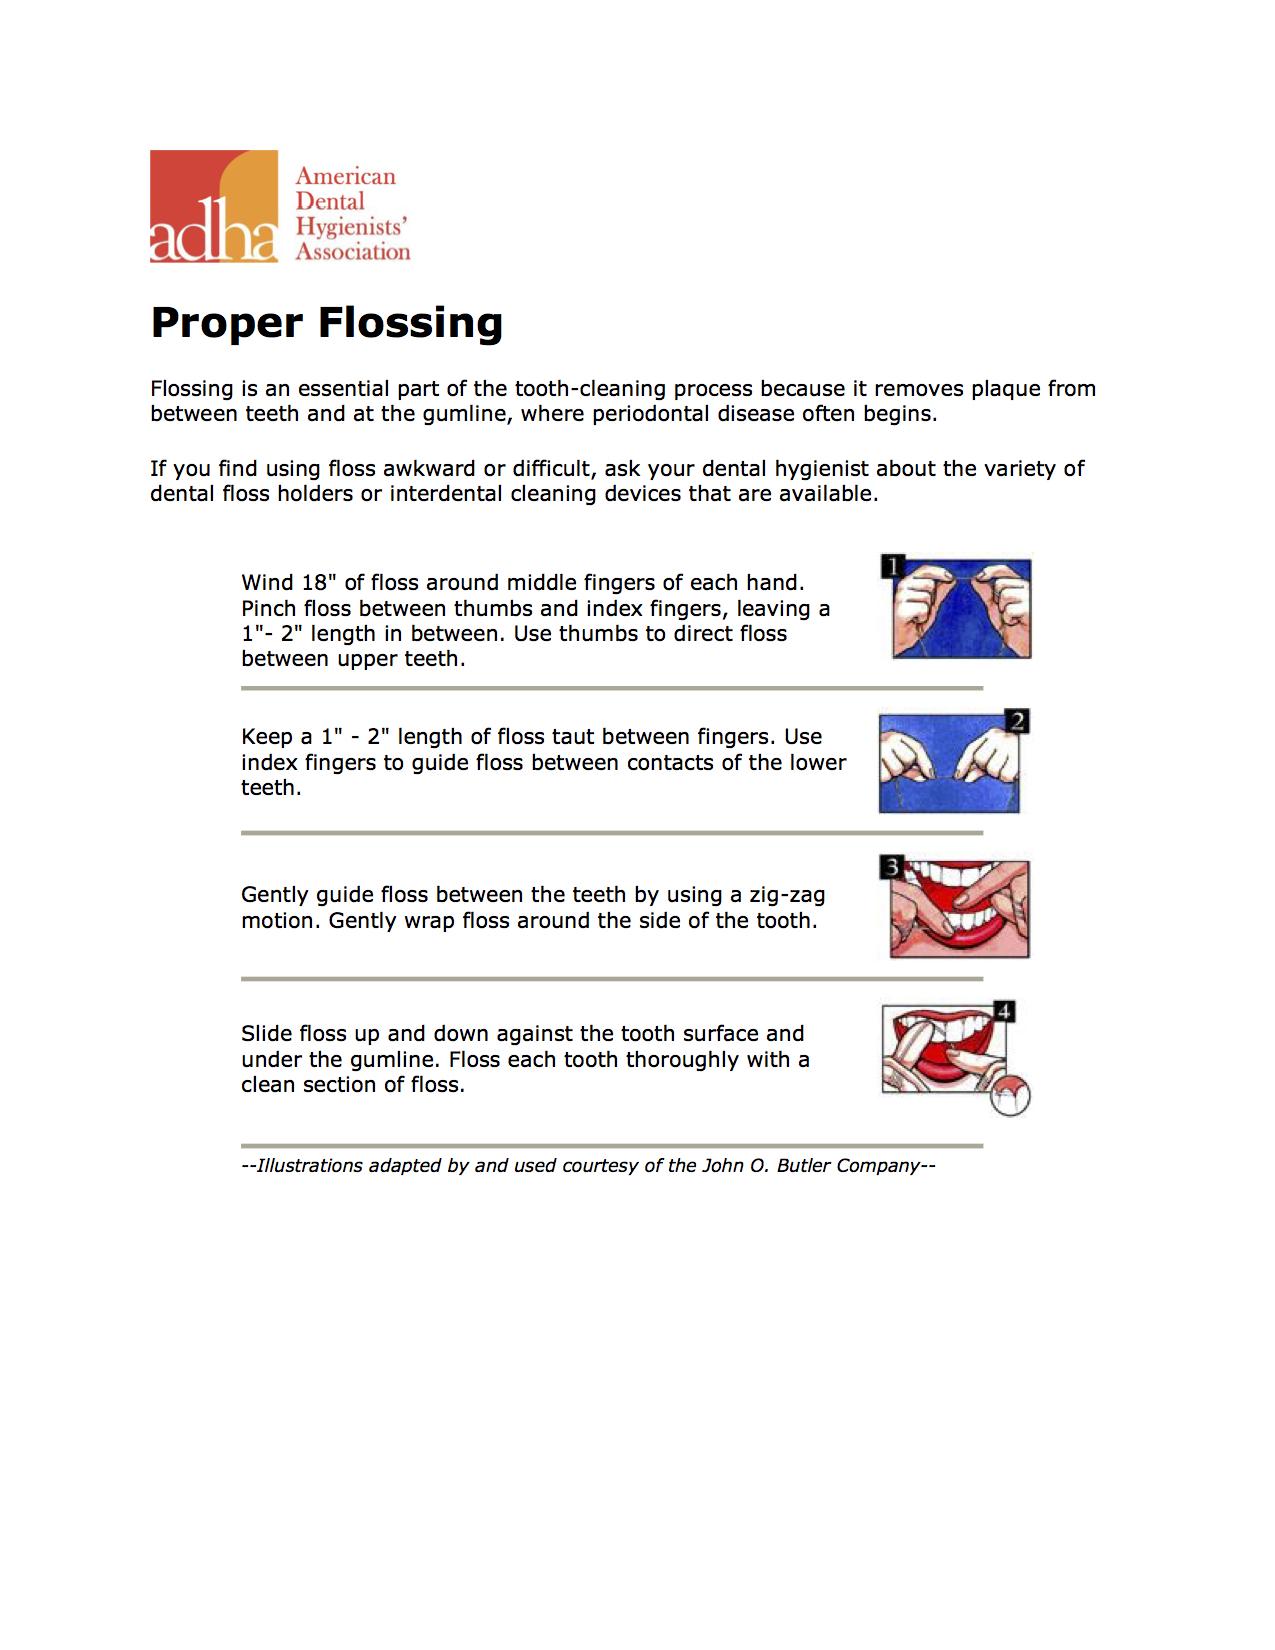 Proper Flossing Technique